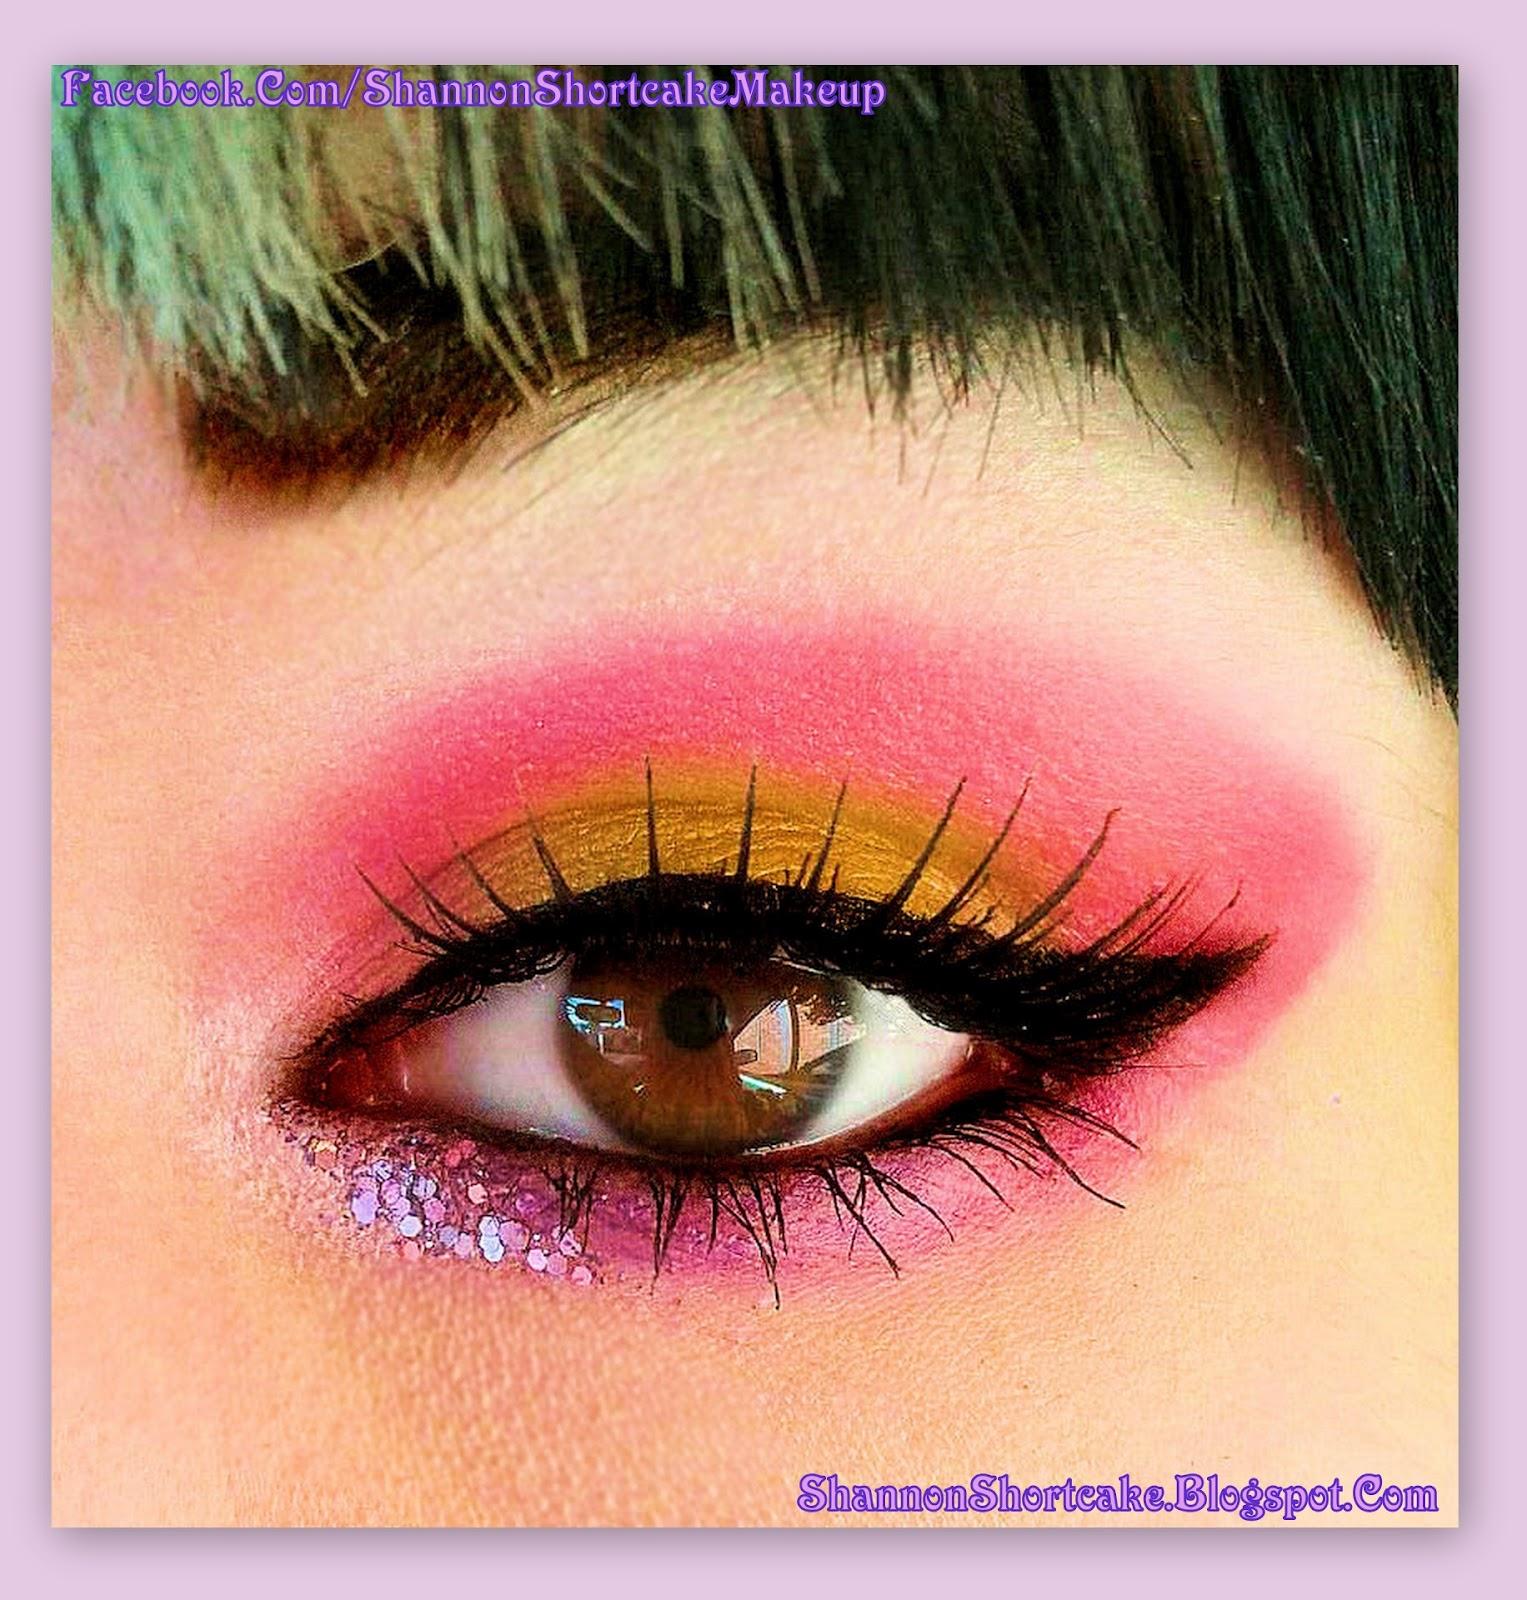 Shannon Shortcake (Makeup Addict): Sprinkle inspired look